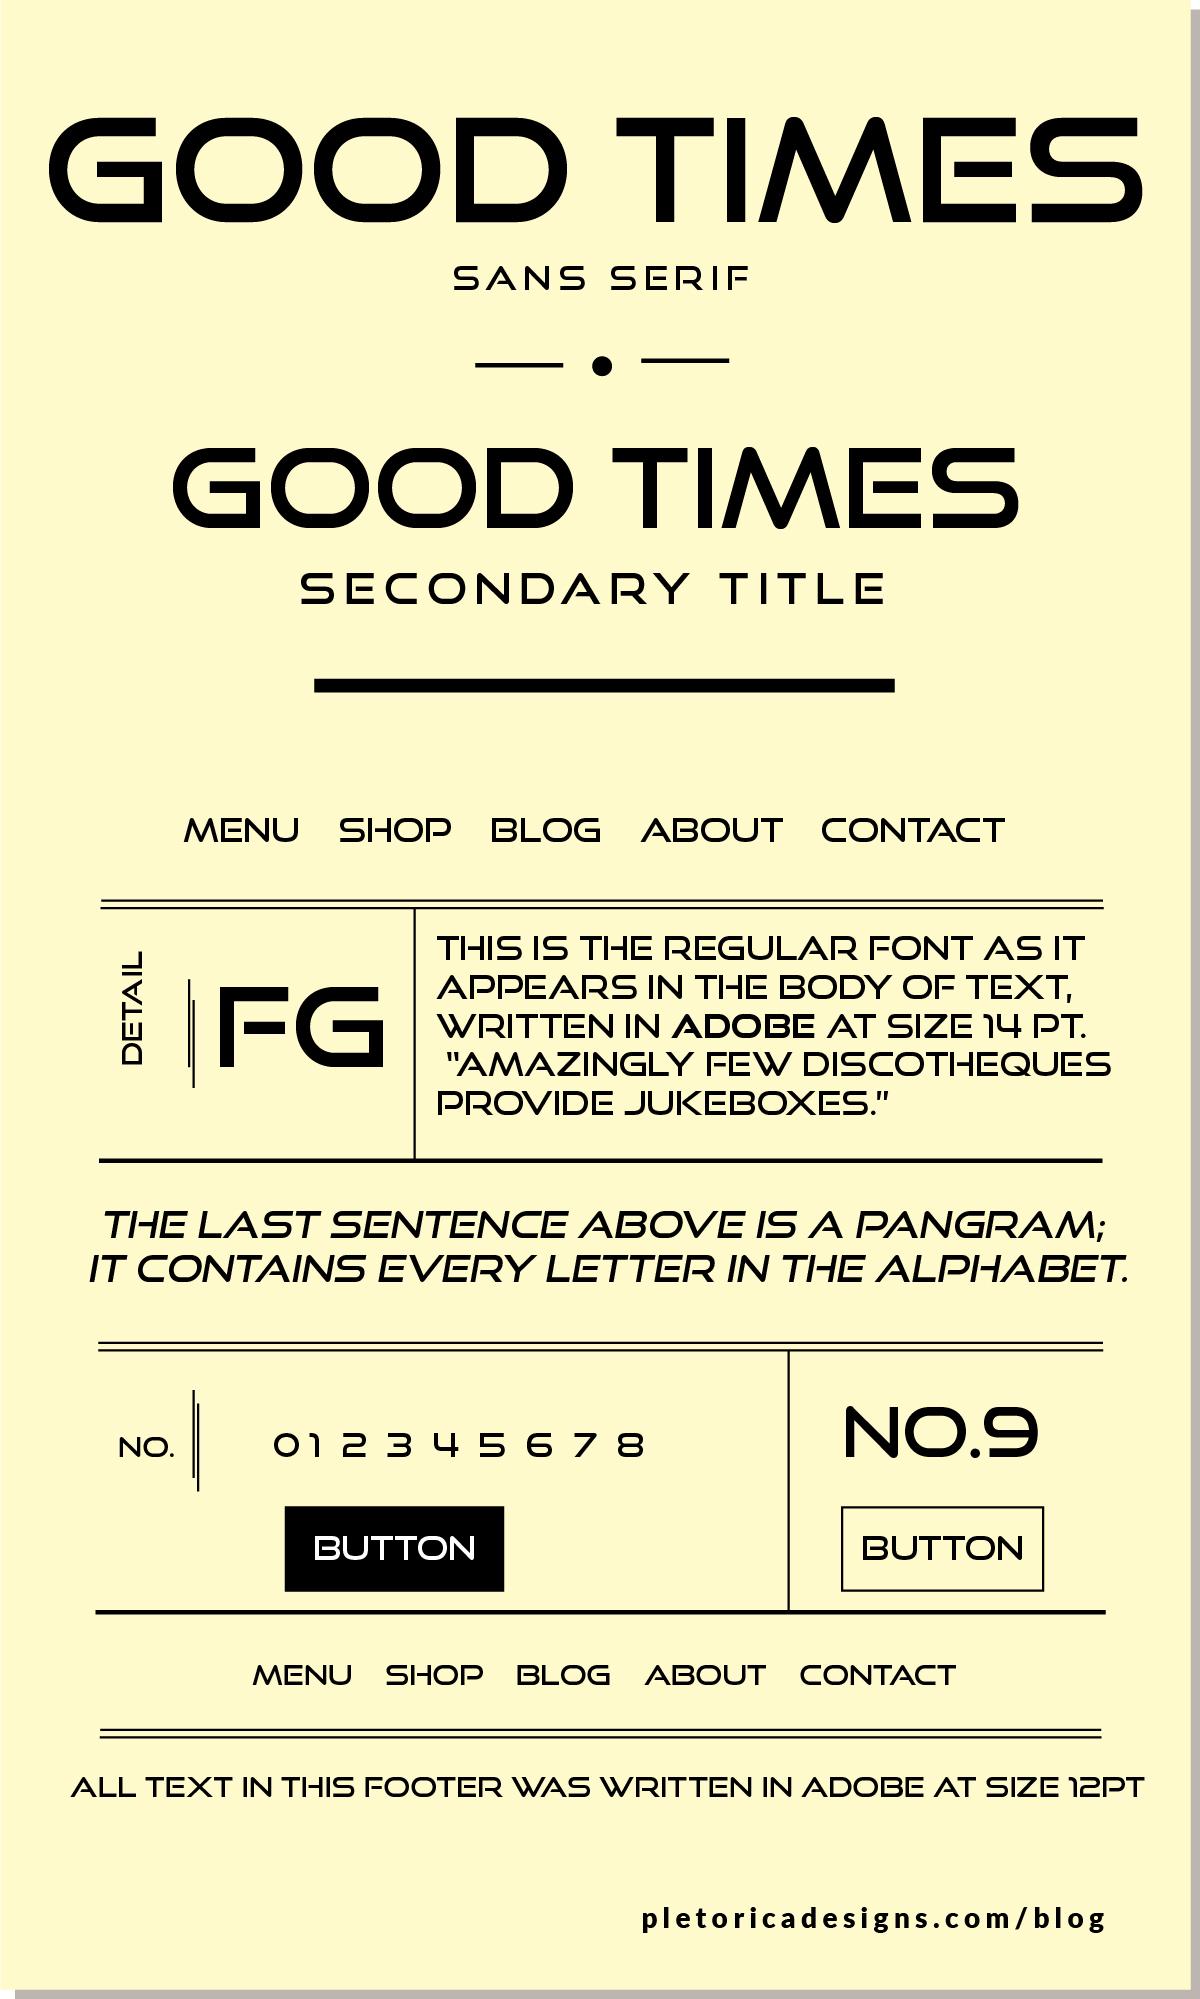 LET'S TYPE: Good Times — PLETÓRICA DESIGNS